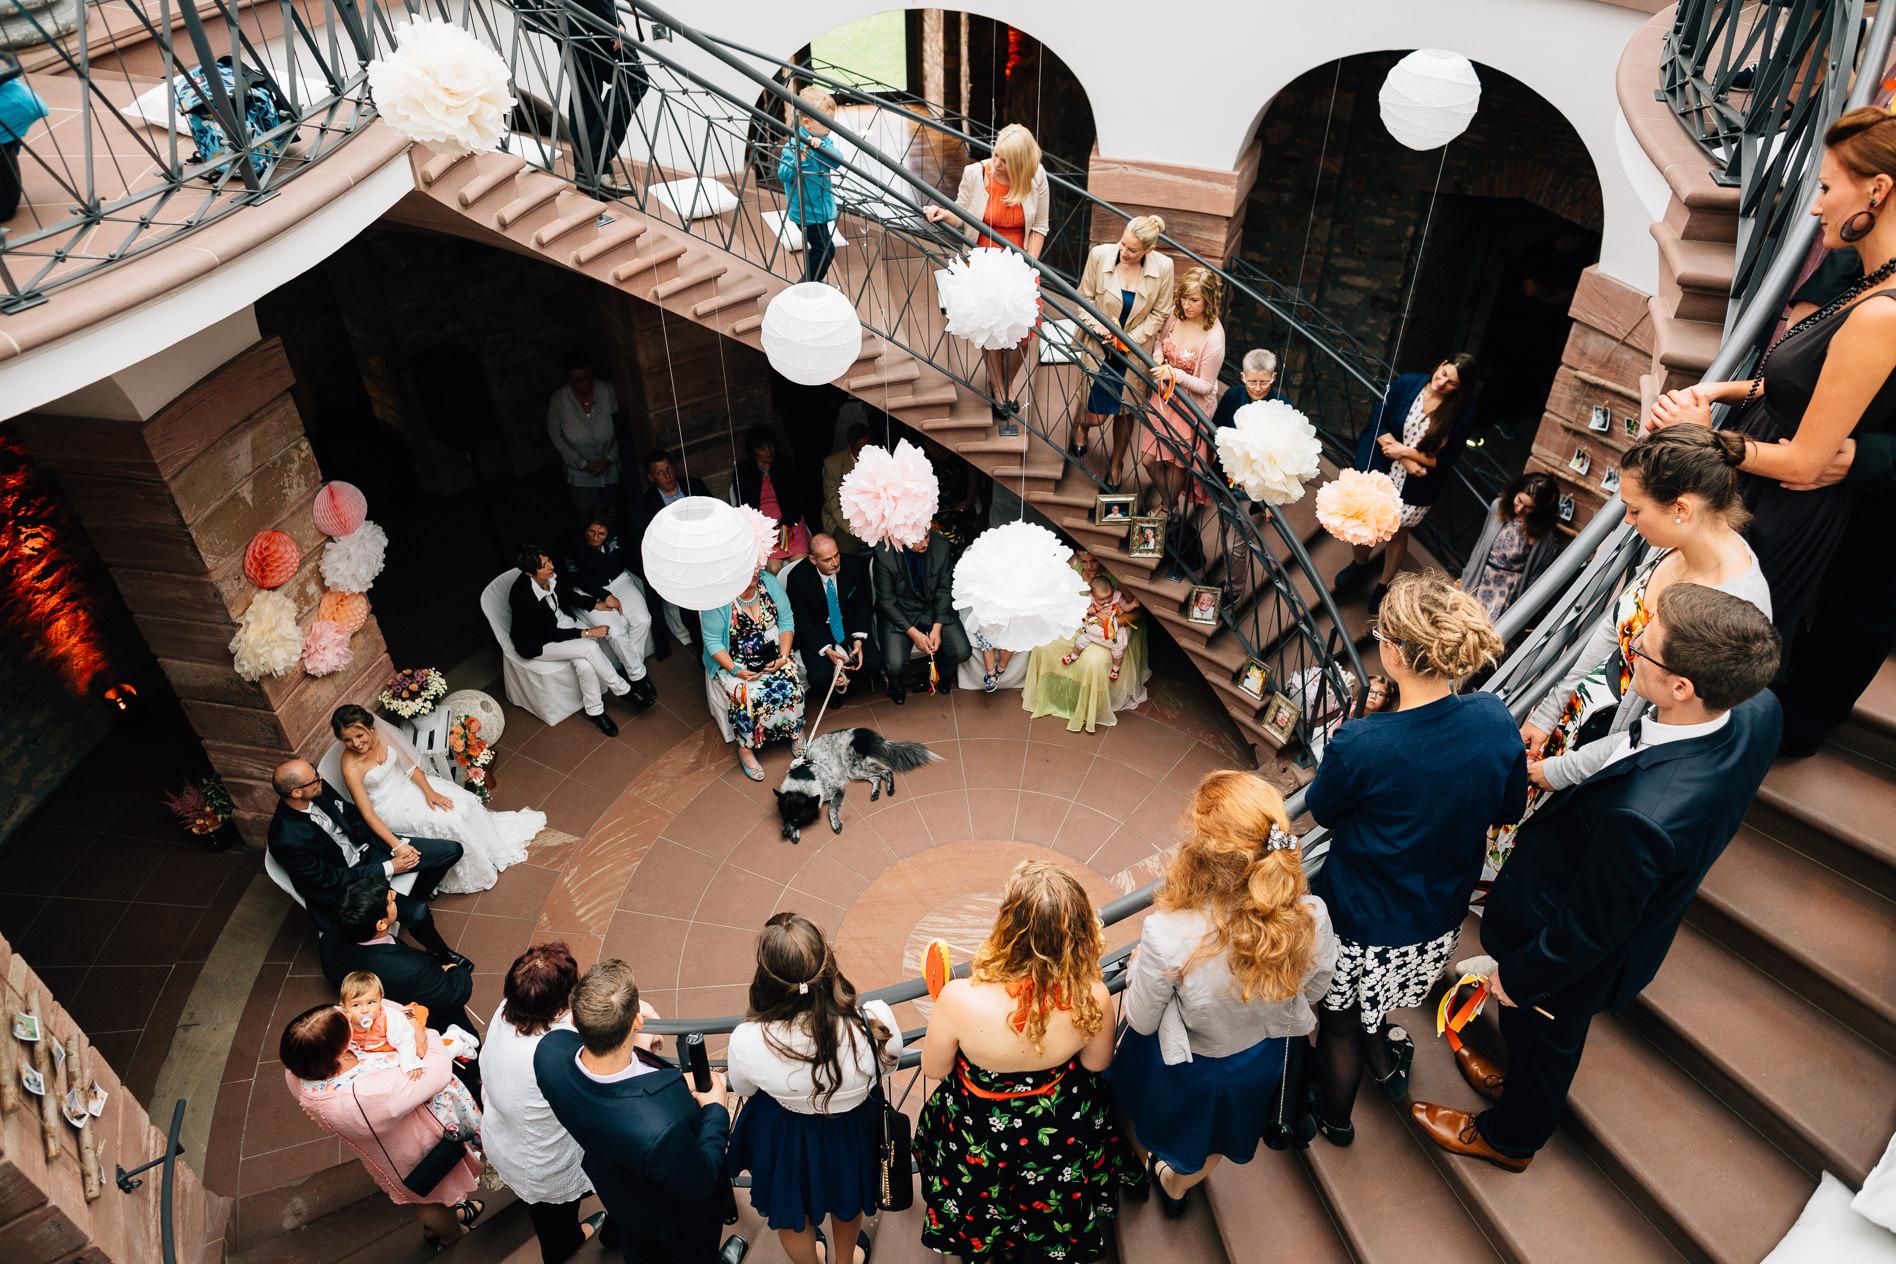 Jagdschloss Platte Wiesbaden Hochzeit; Hochzeitsfotograf